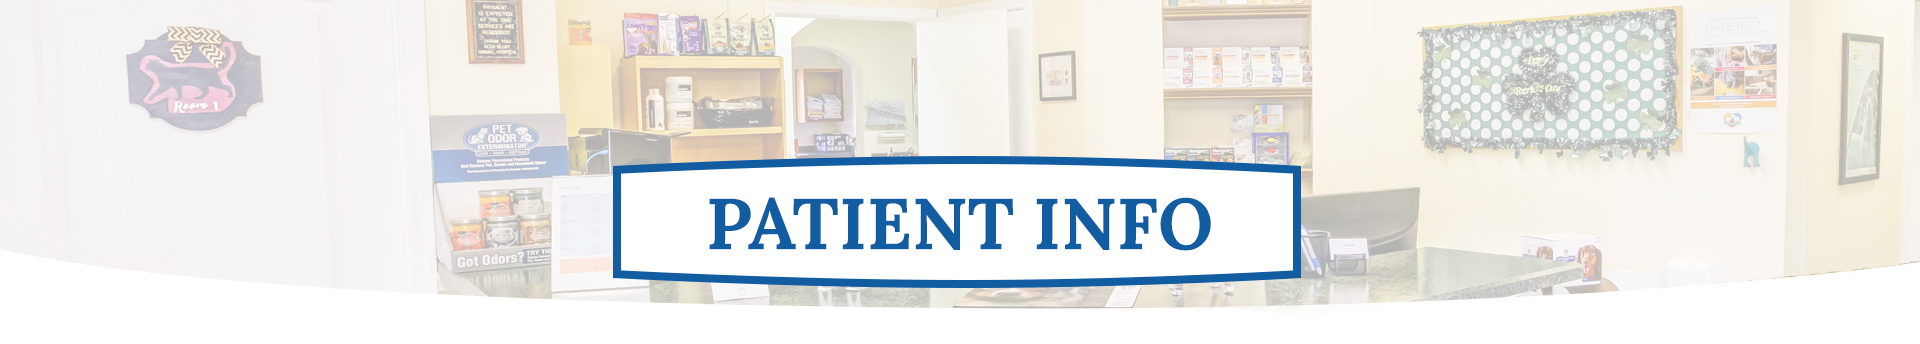 Pet Patient | Alta Bluff Animal Hospital Jacksonville FL